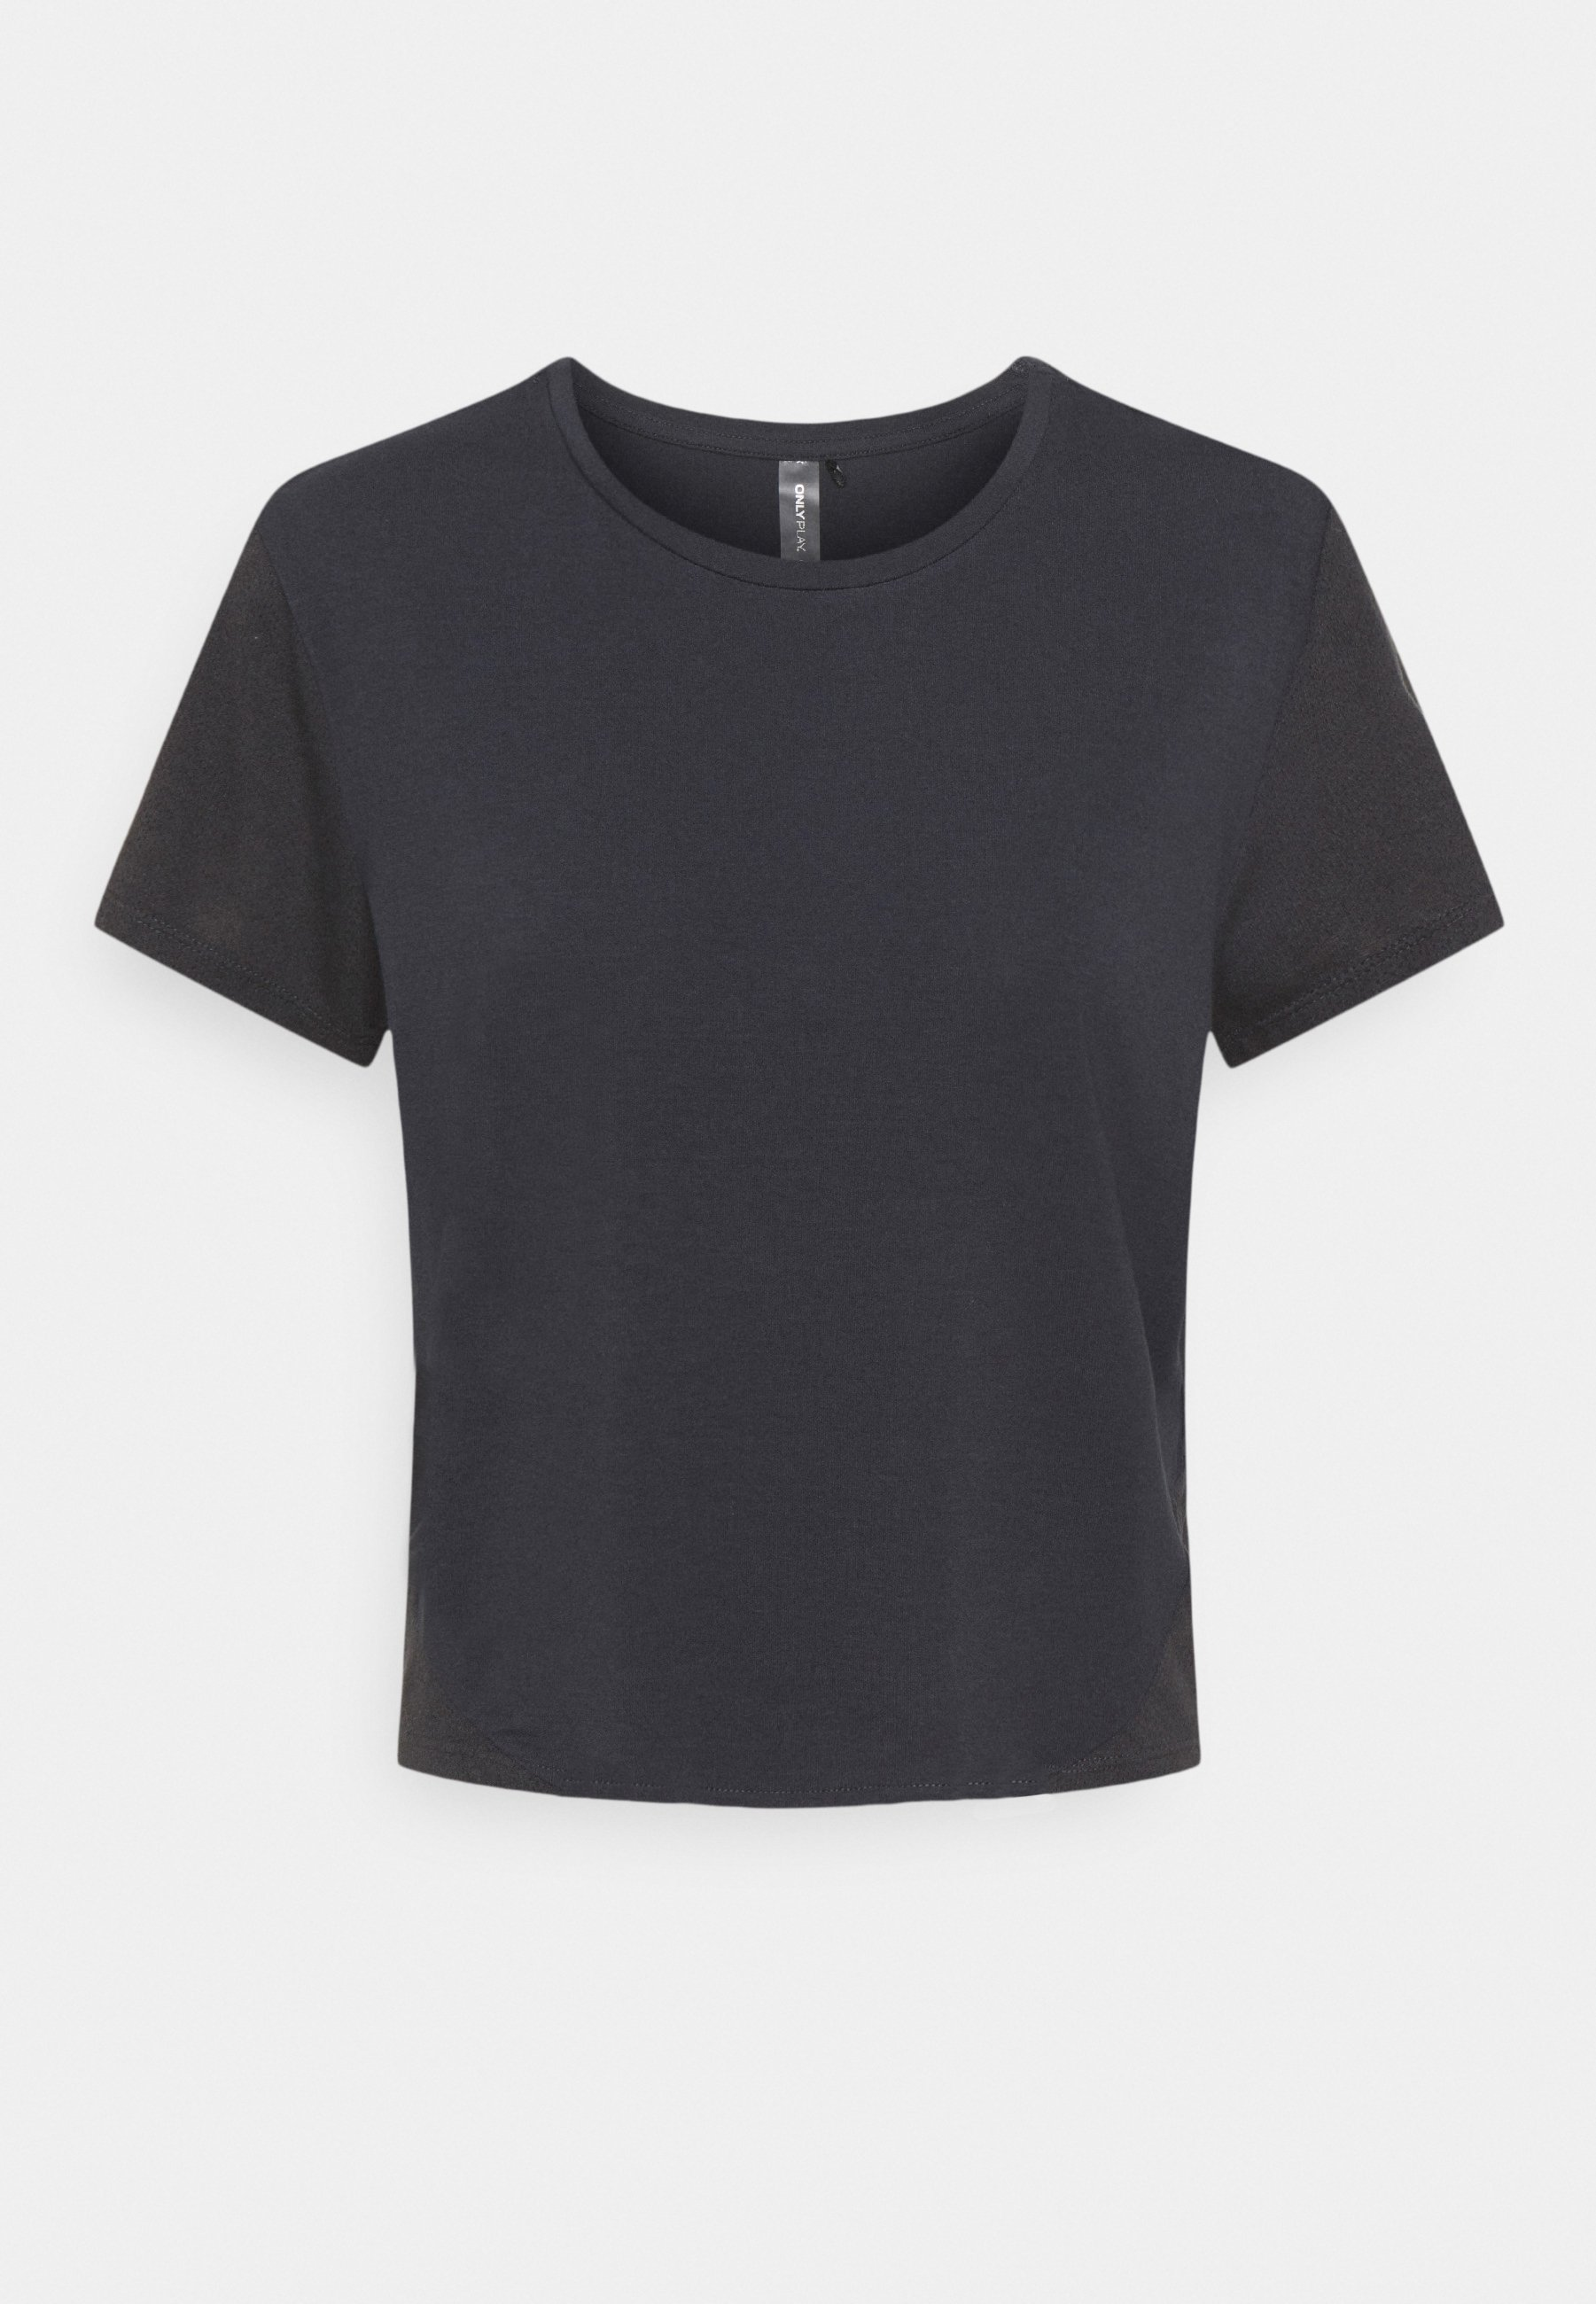 Femme ONPMAIDA CROPPED TOP - T-shirt basique